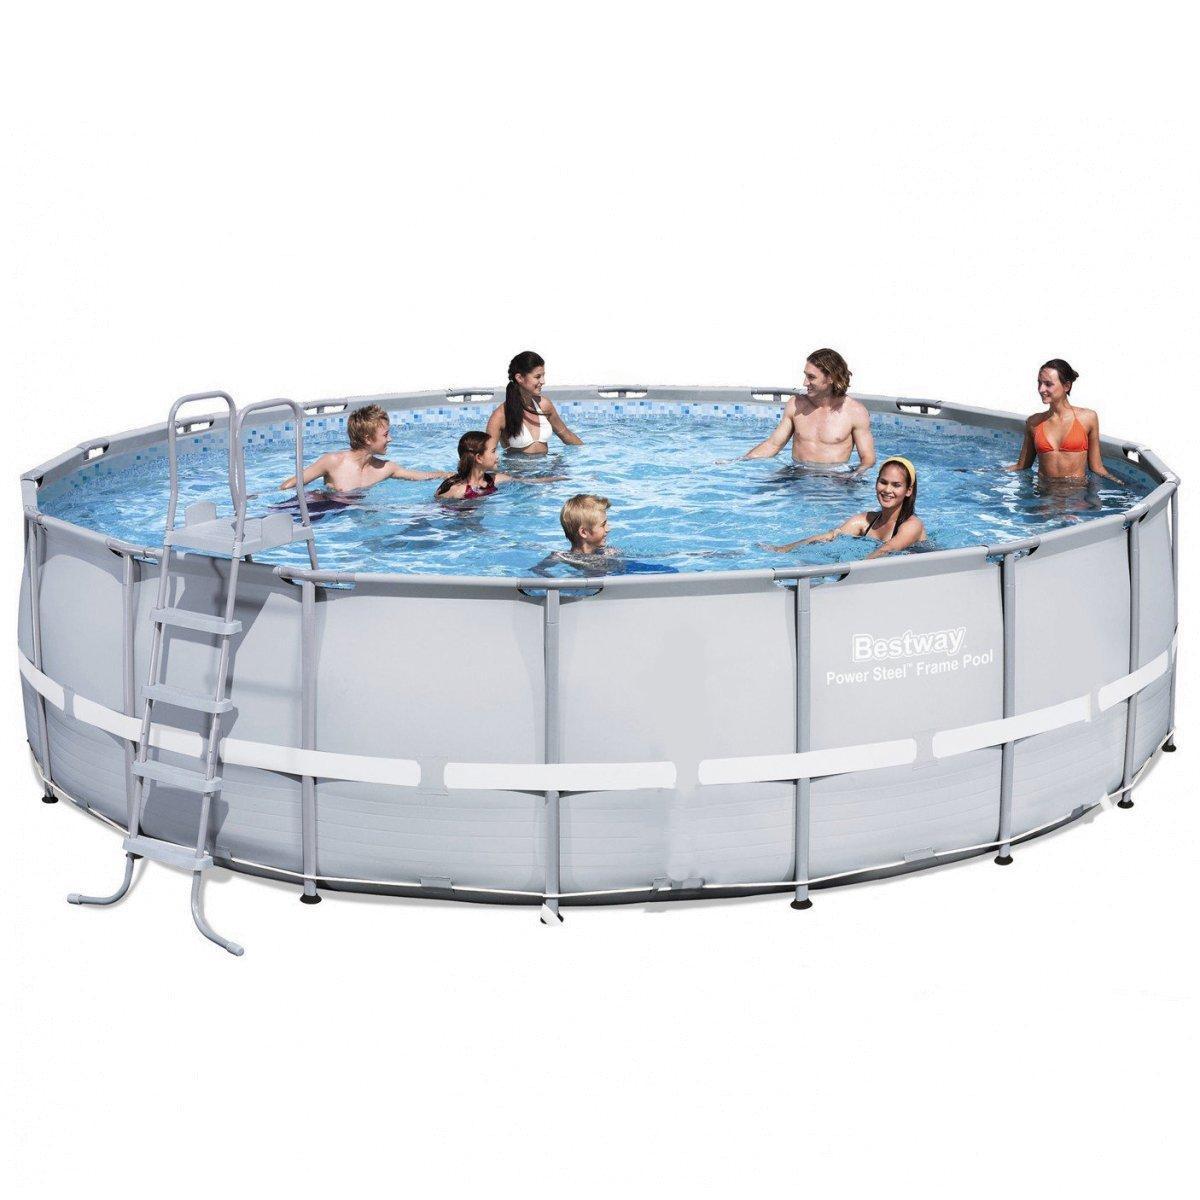 Каркасный бассейн Bestway 56705 - 1, 671 х 132 см (лестница, подстилка, тент)